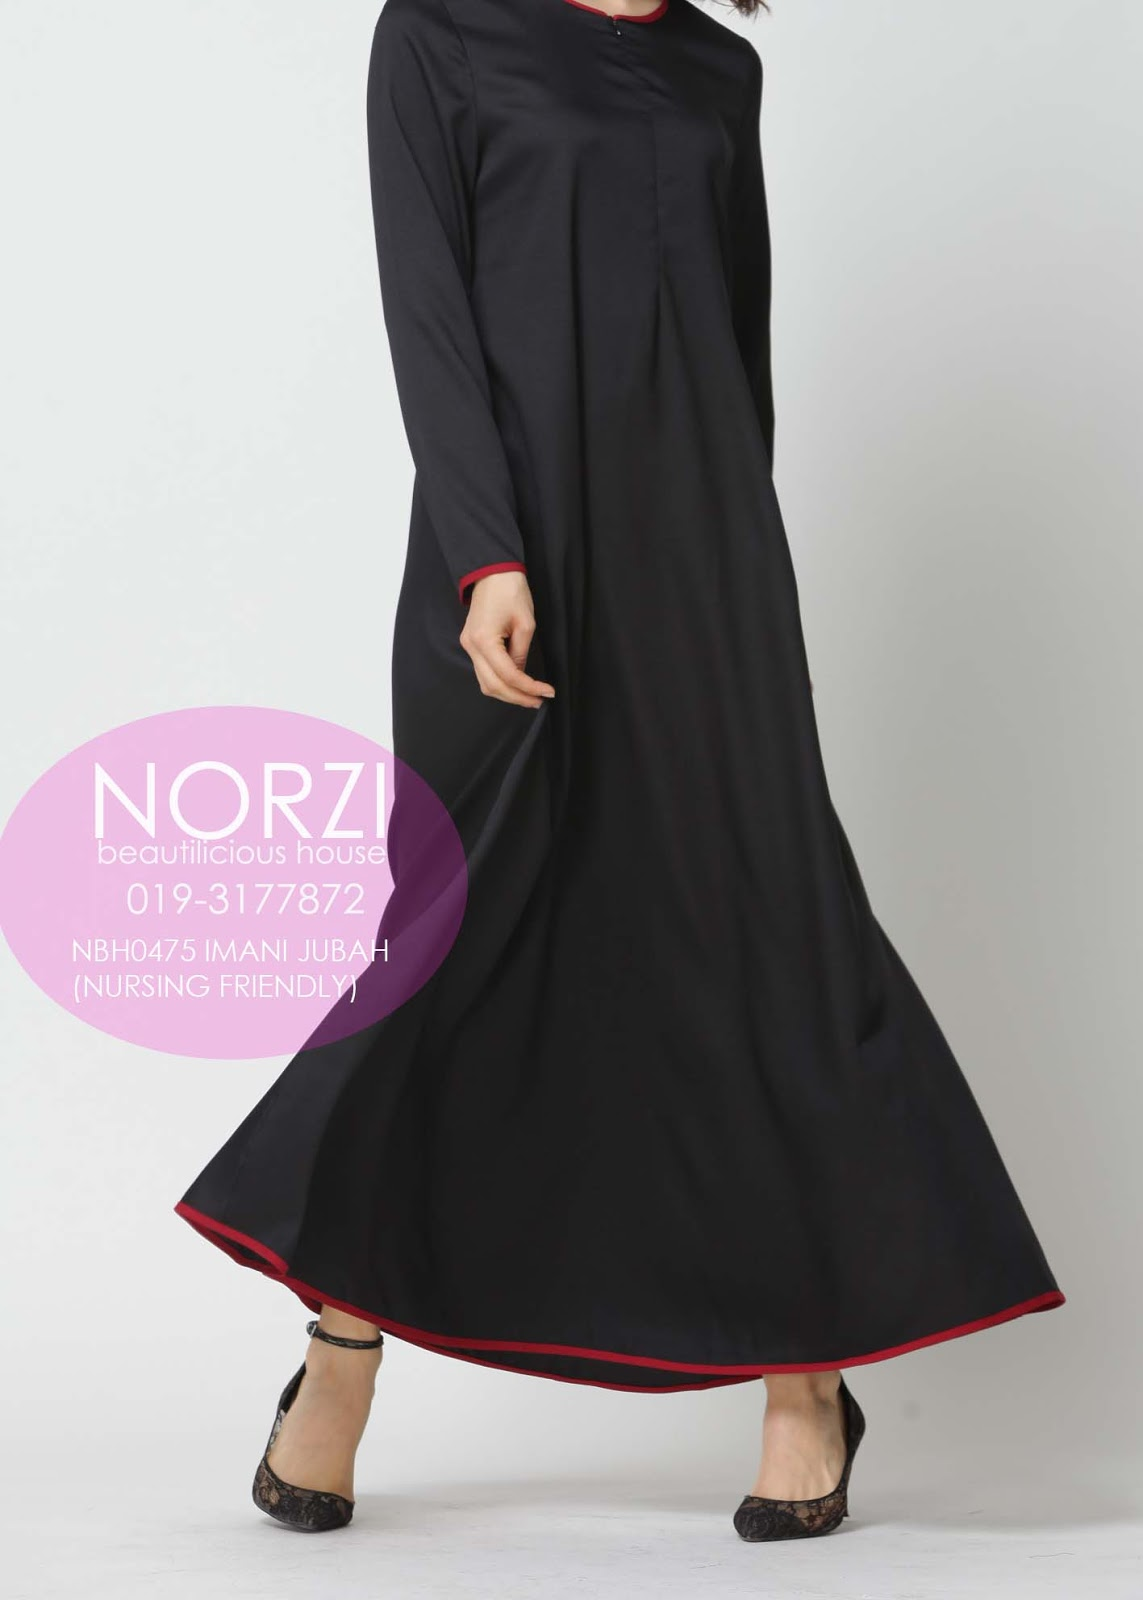 Norzi Beautilicious House Nbh0475 Imani Jubah Nursing